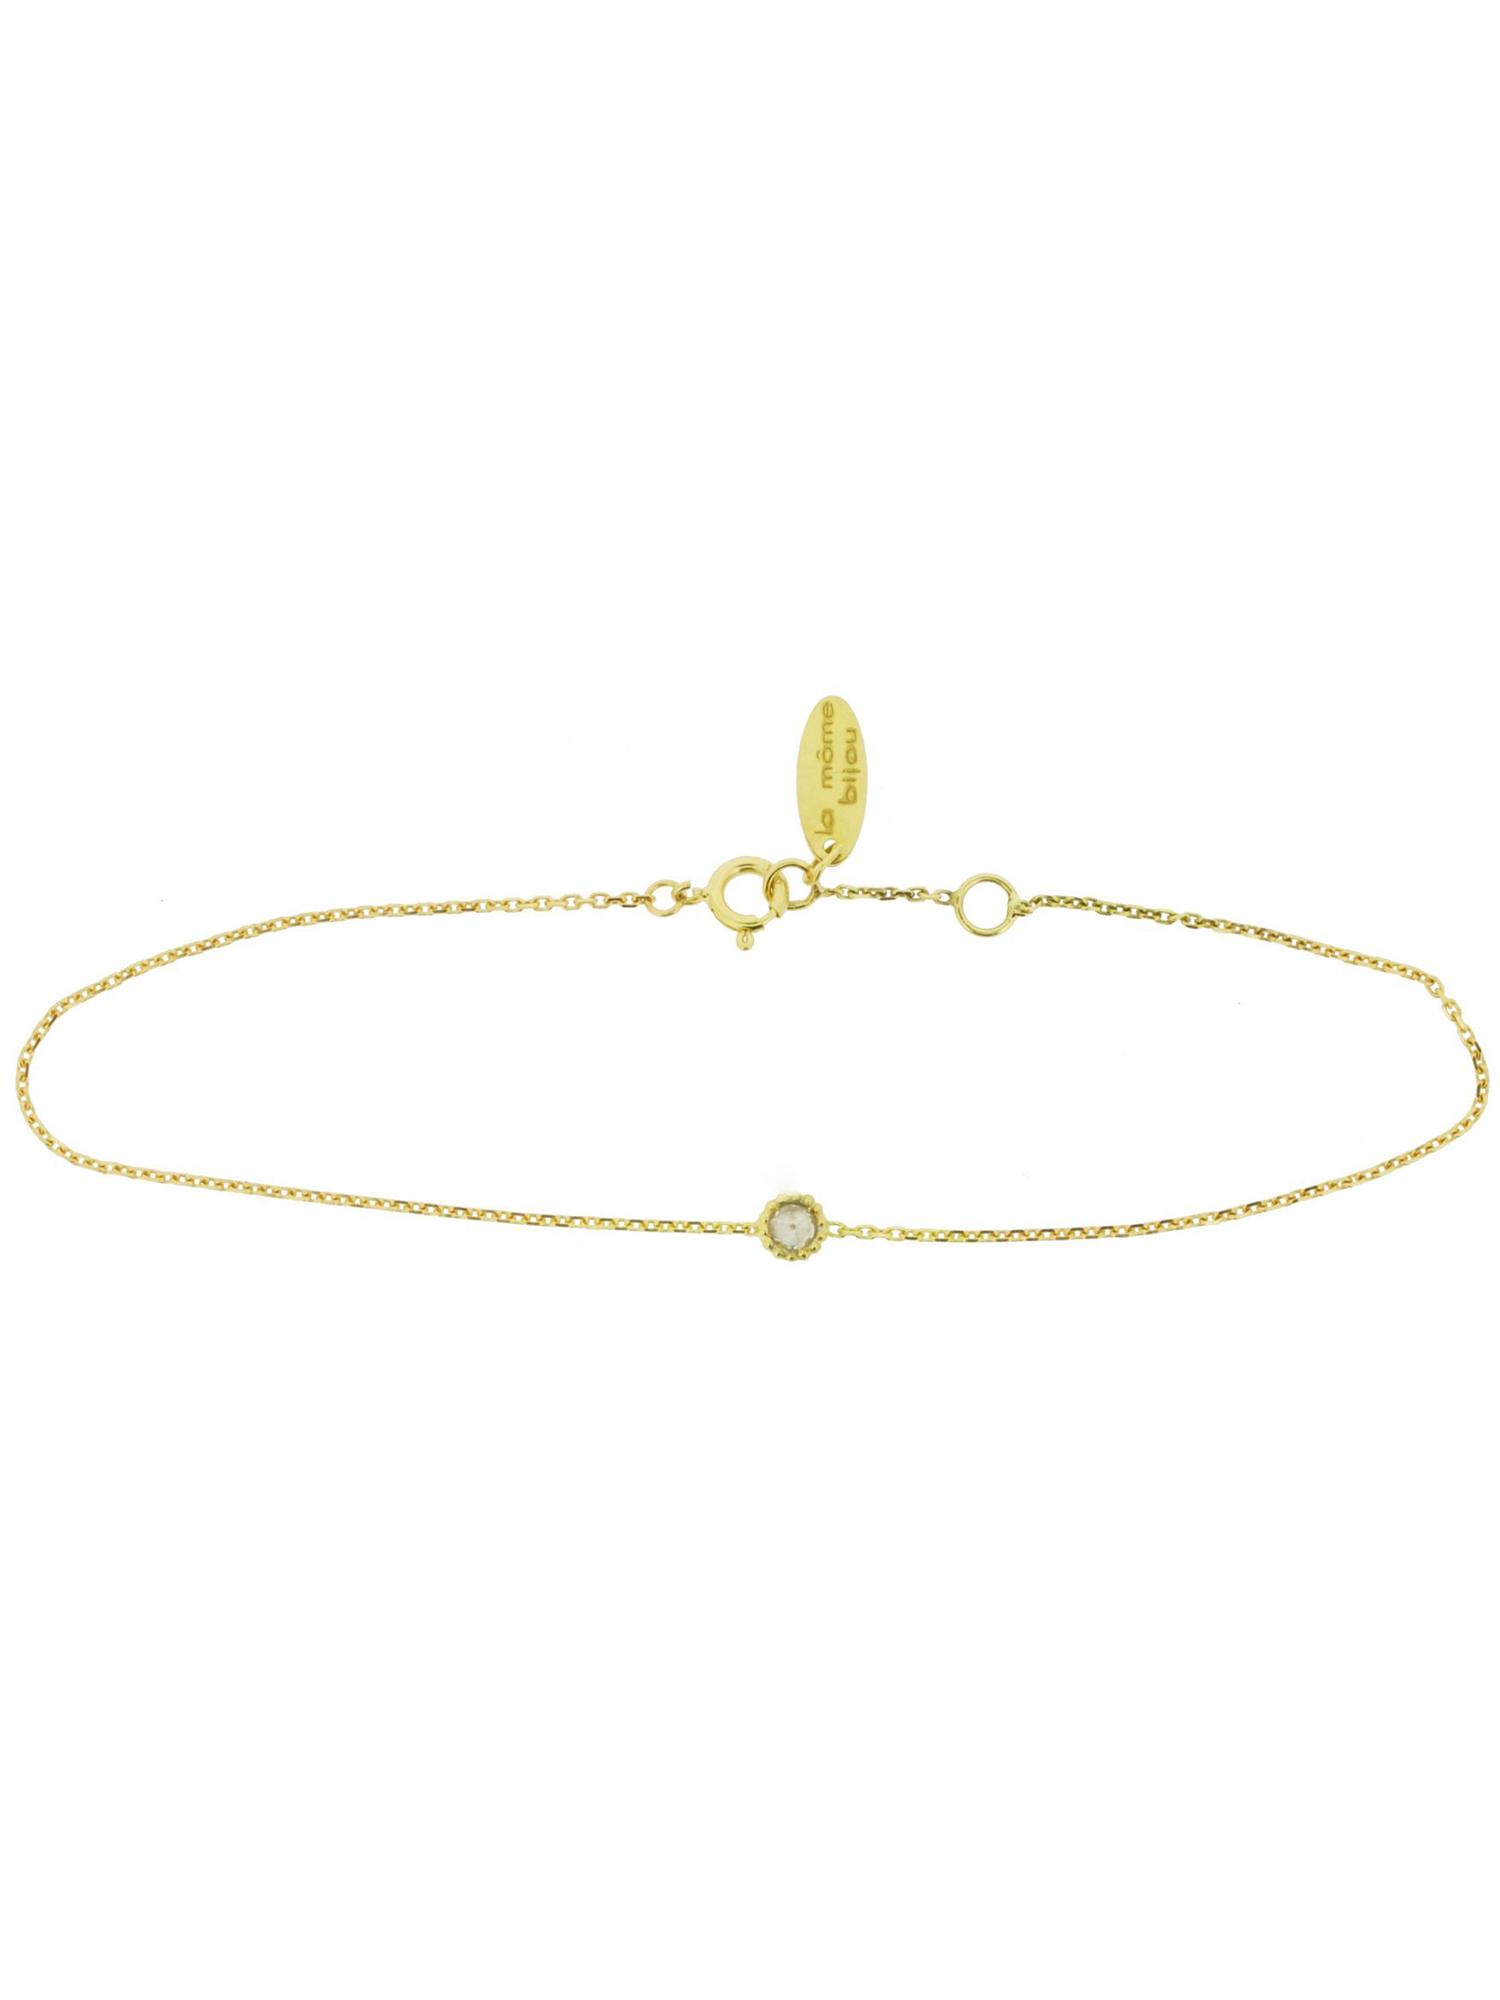 A môme bijou pretty bolly diamond bracelet in k yellow gold